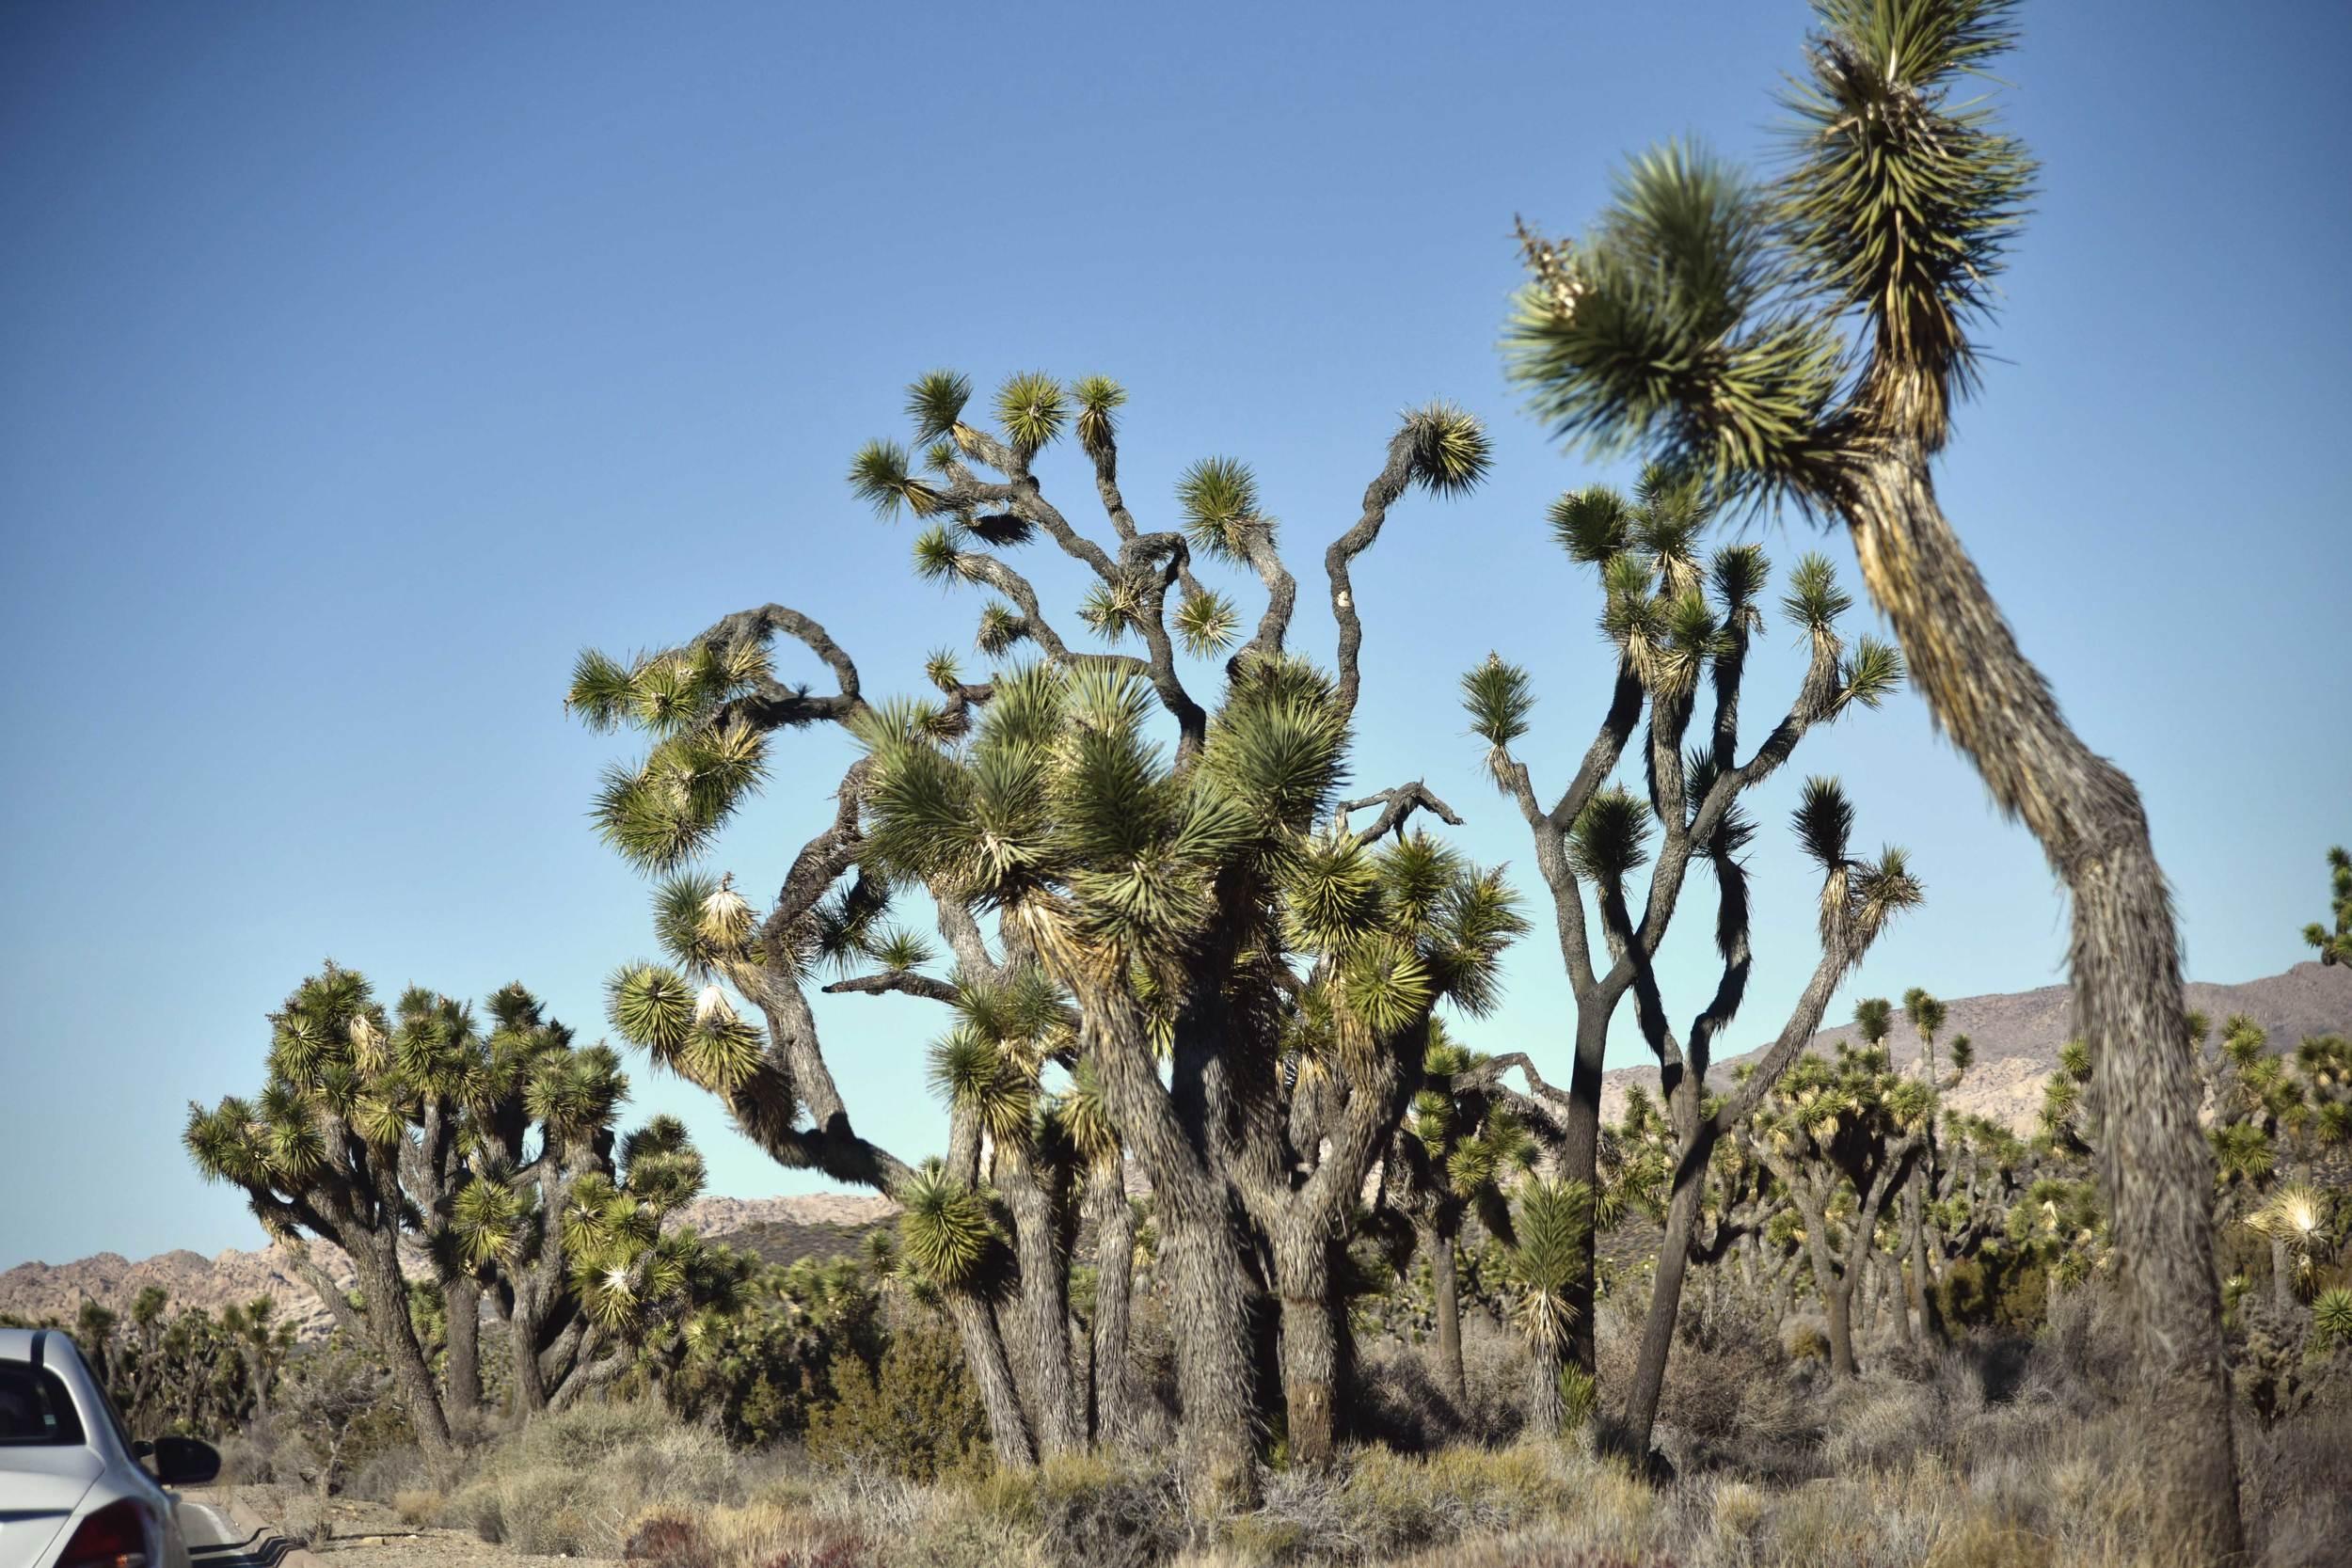 Joshua Tree National Park, Southern California, USA. Image©thingstodot.com